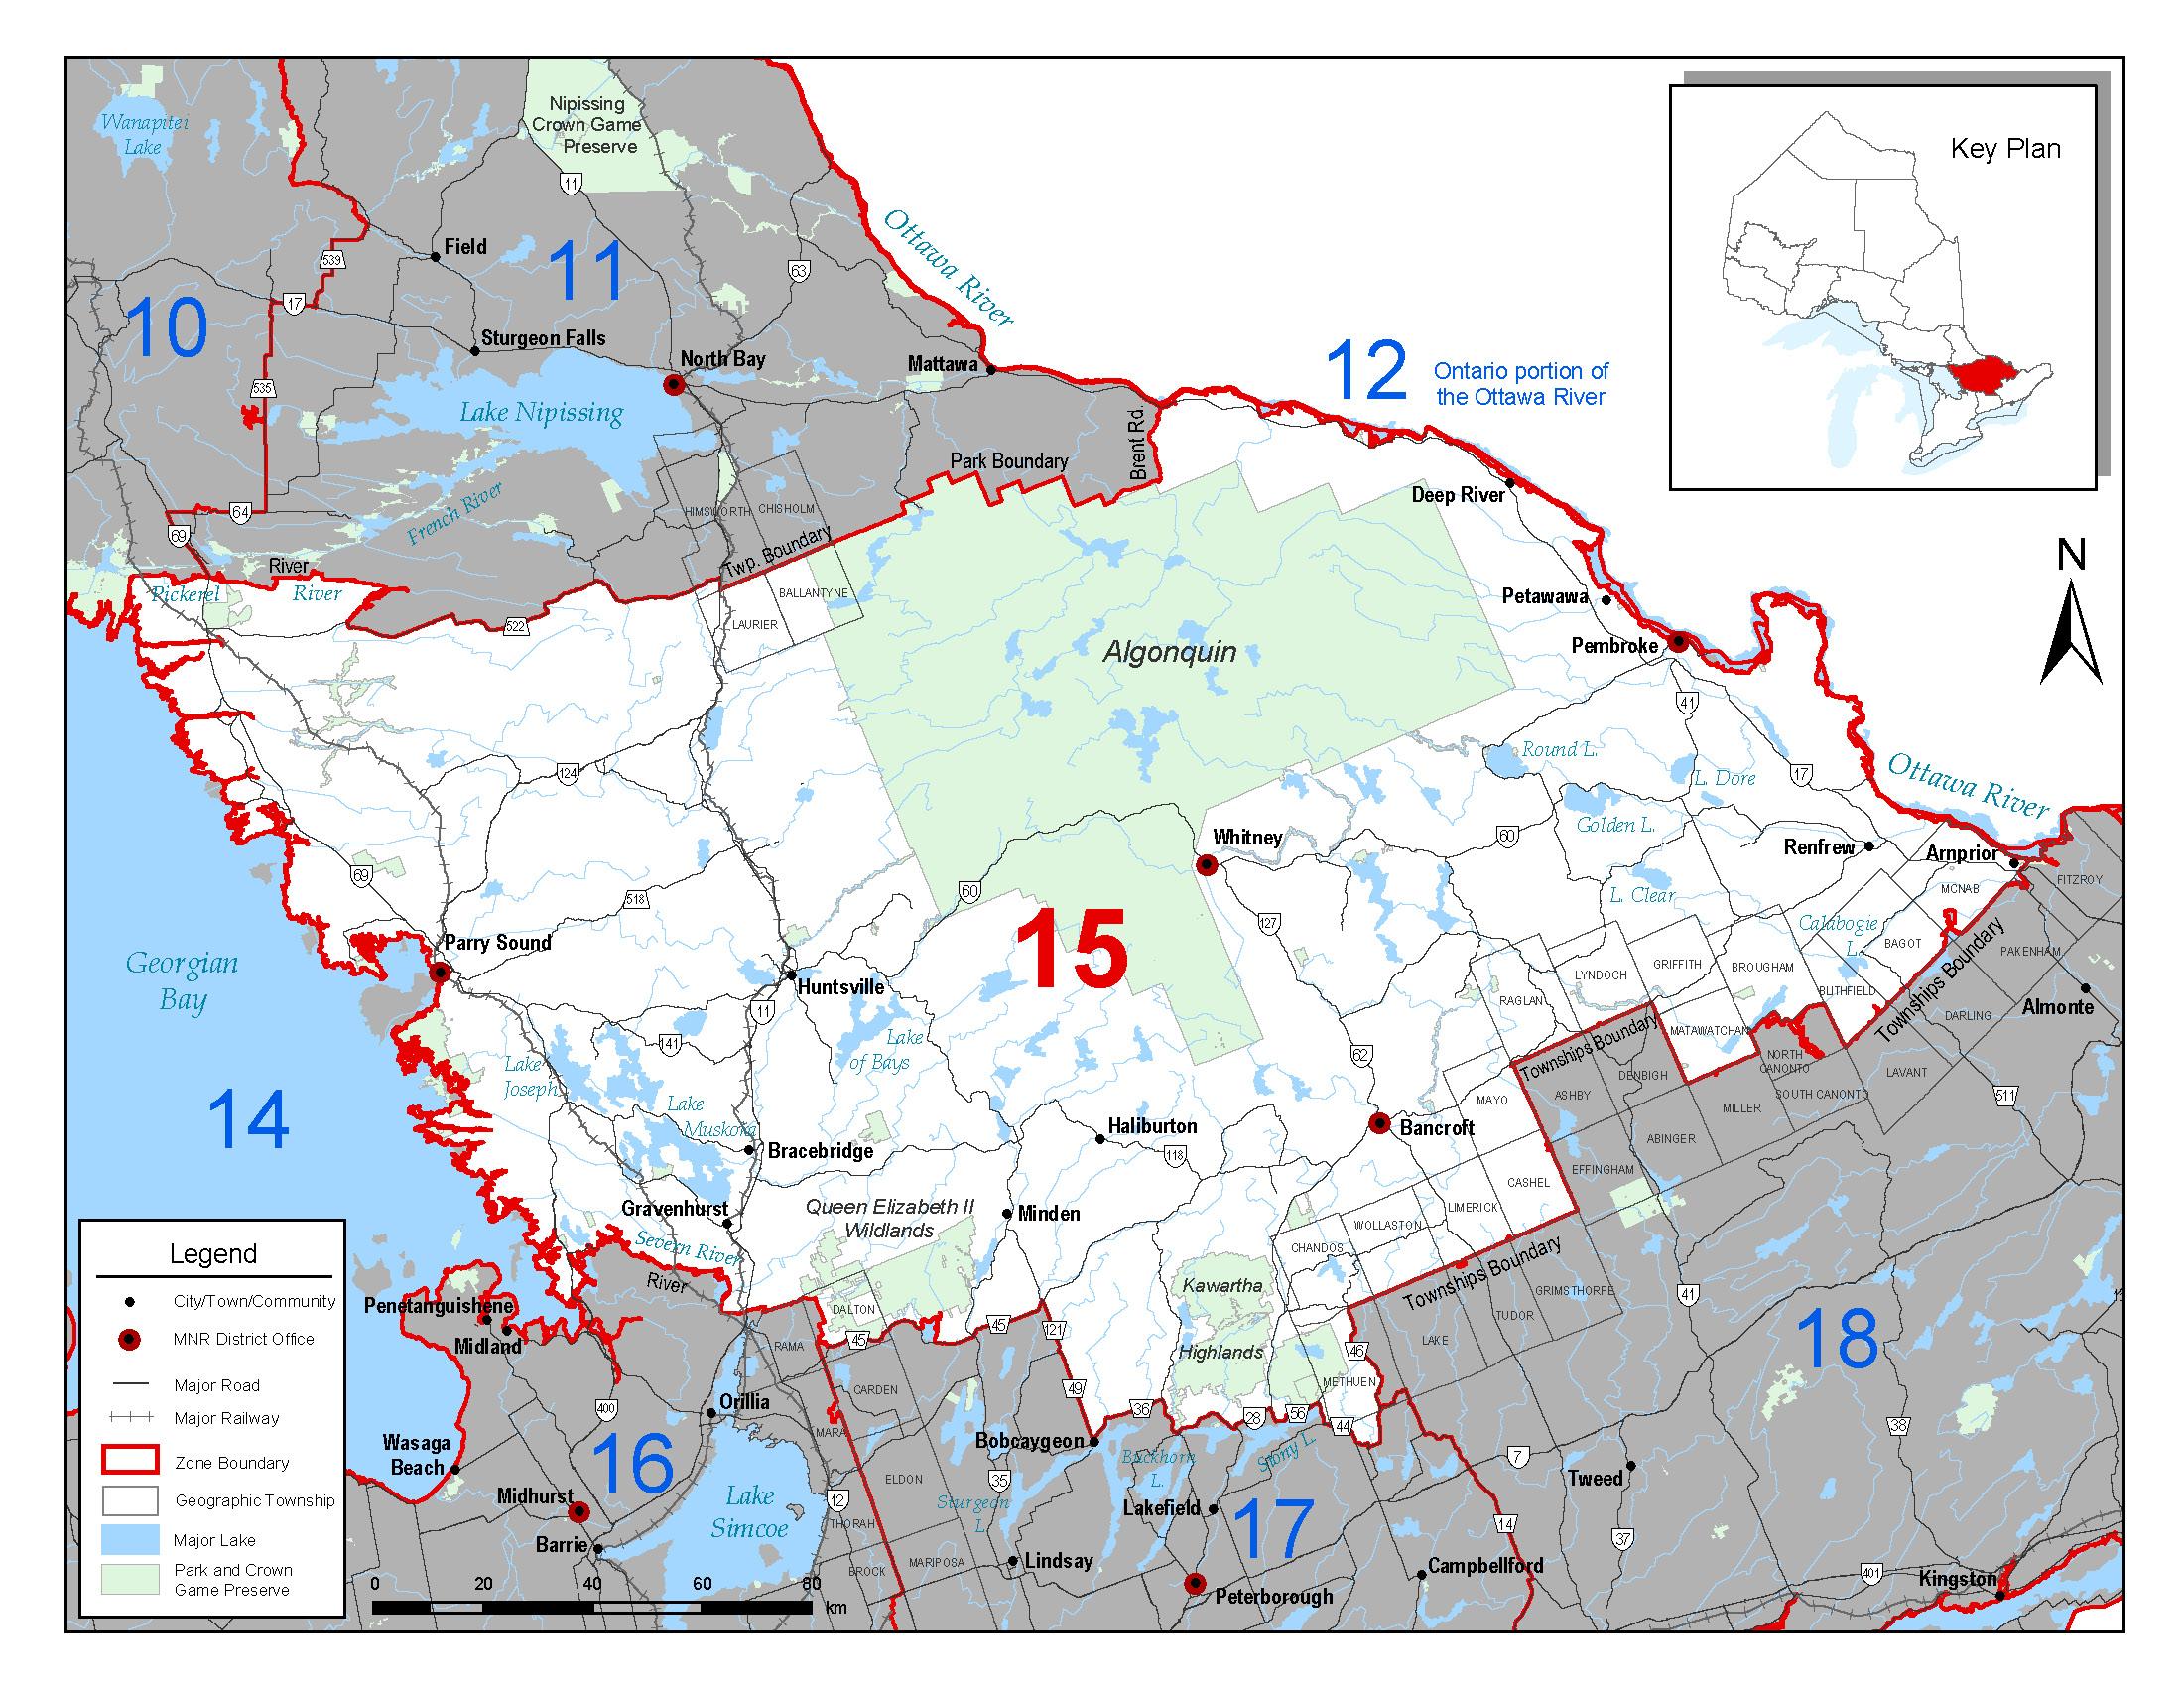 Fisheries management zone 15 fmz 15 for Ontario fishing license